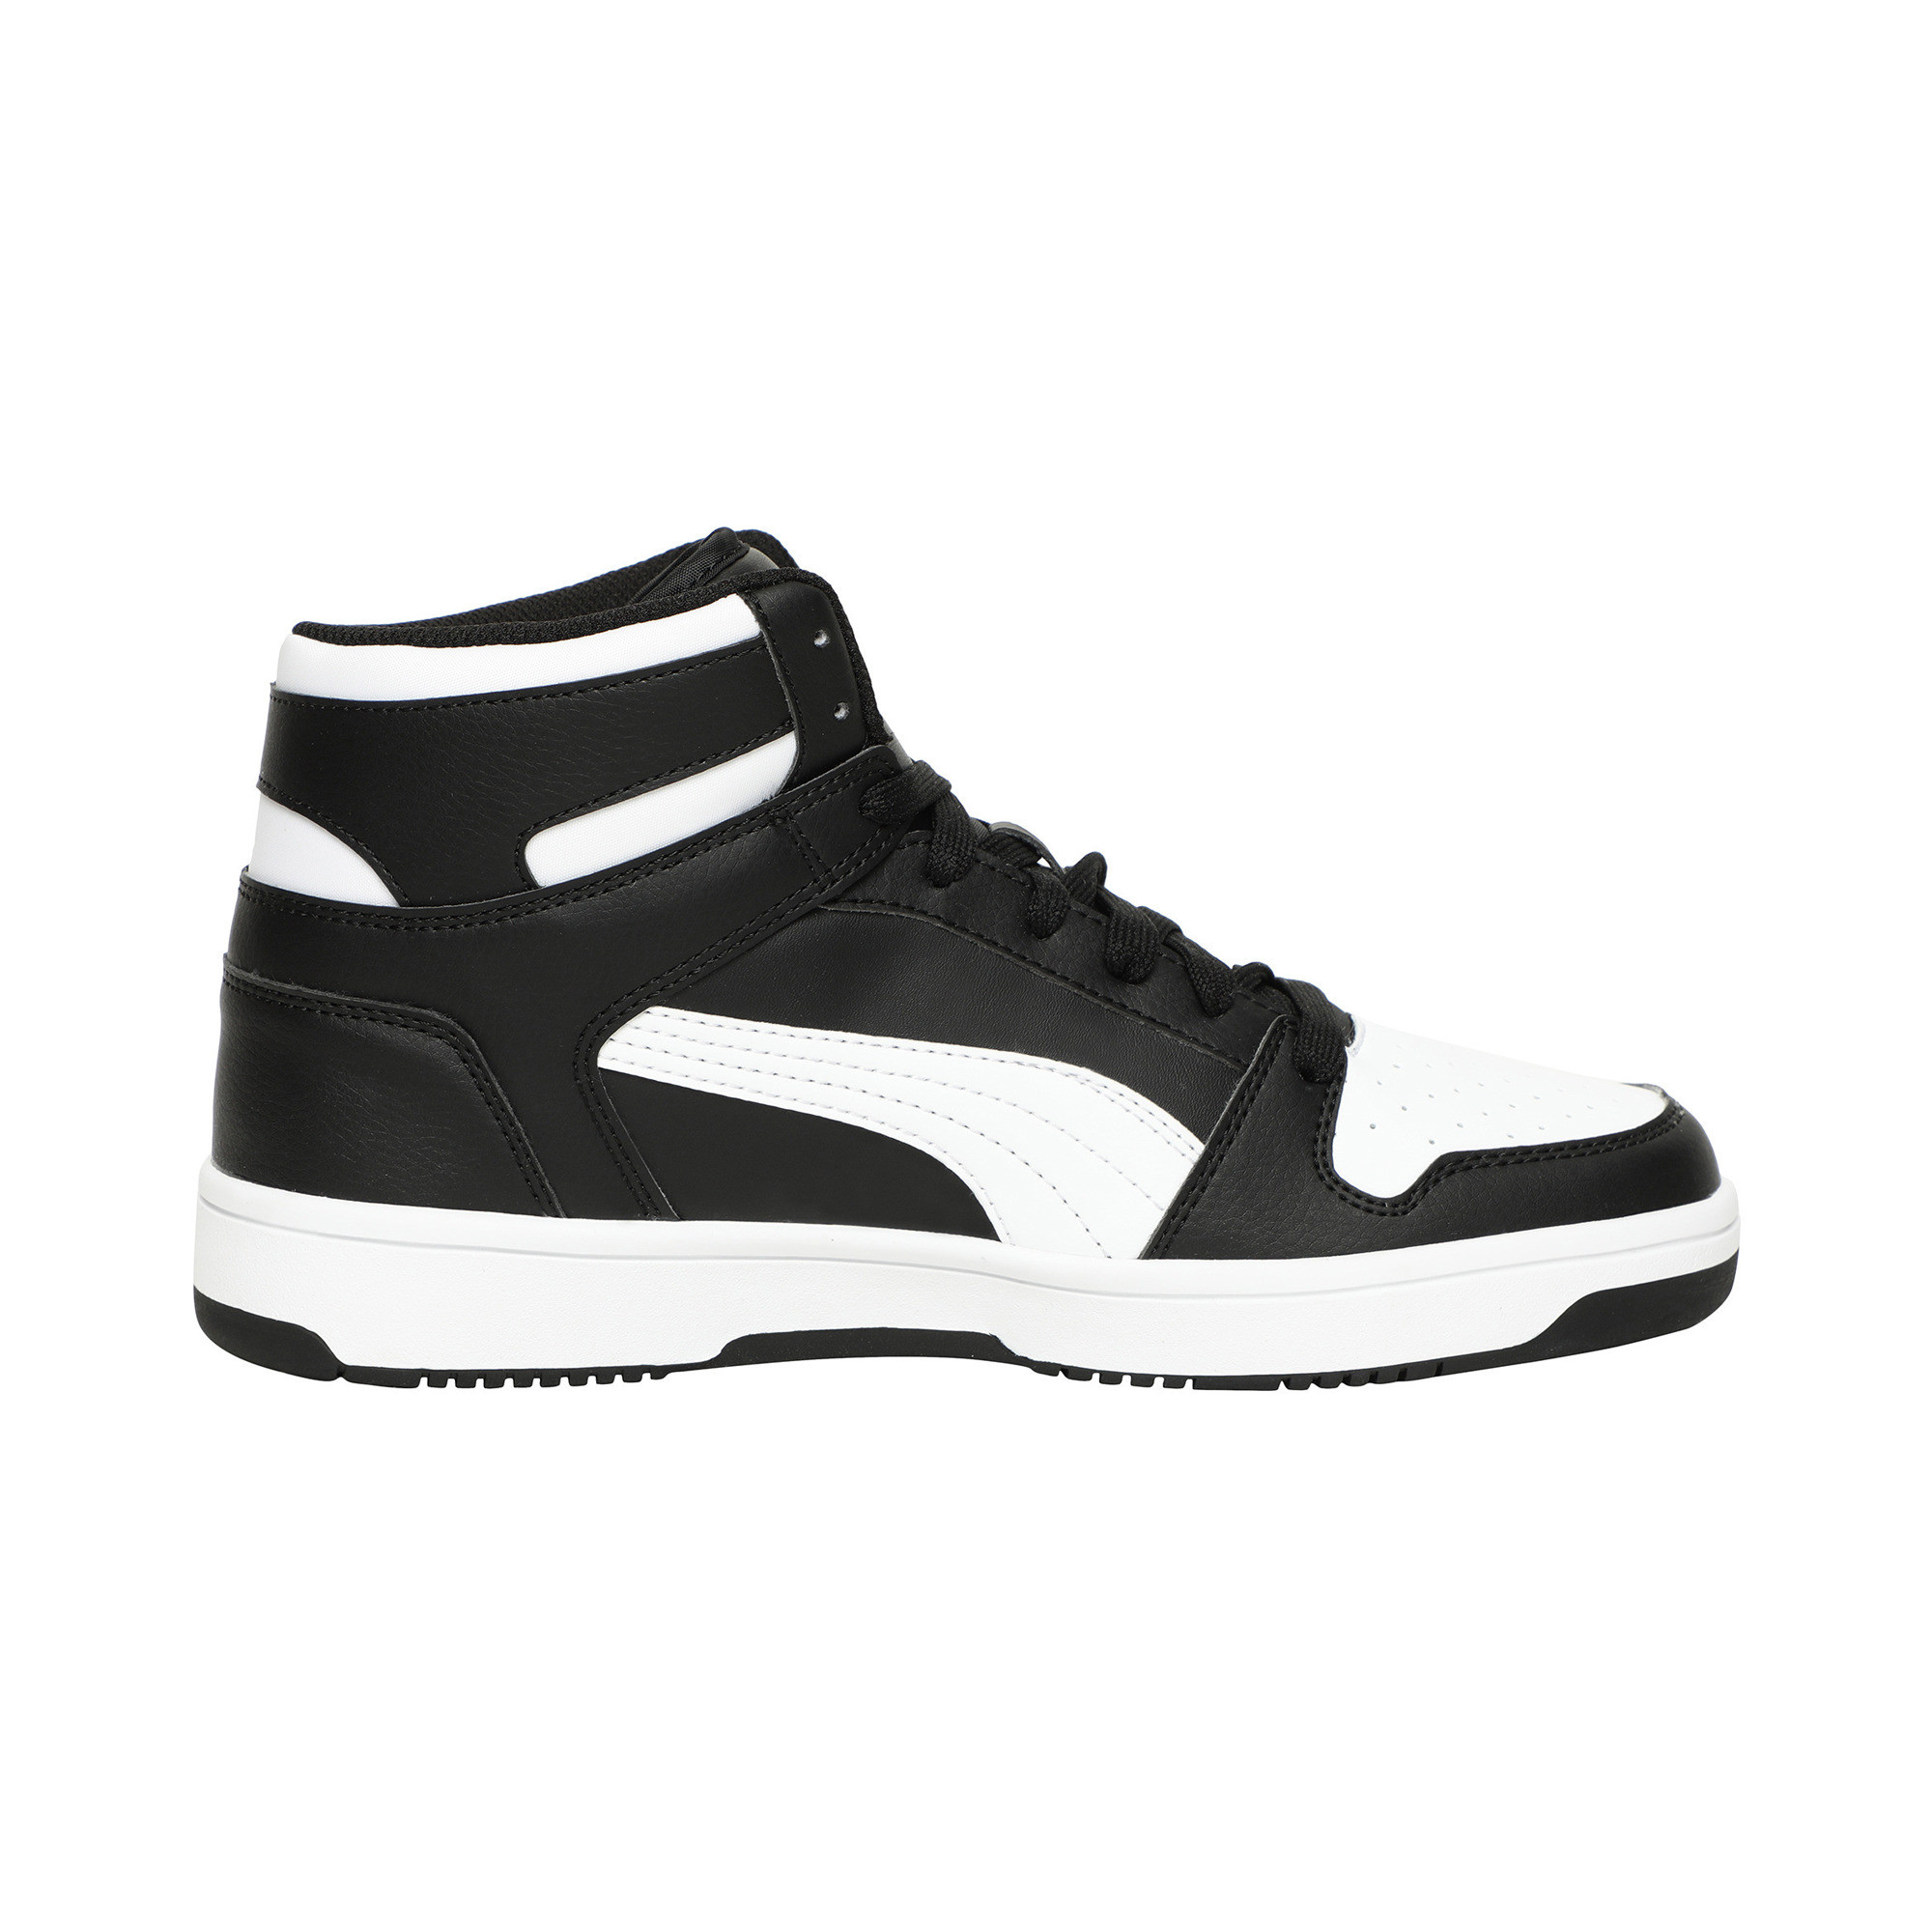 PUMA-PUMA-Rebound-LayUp-Men-039-s-Sneakers-Men-Mid-Boot-Basics thumbnail 6